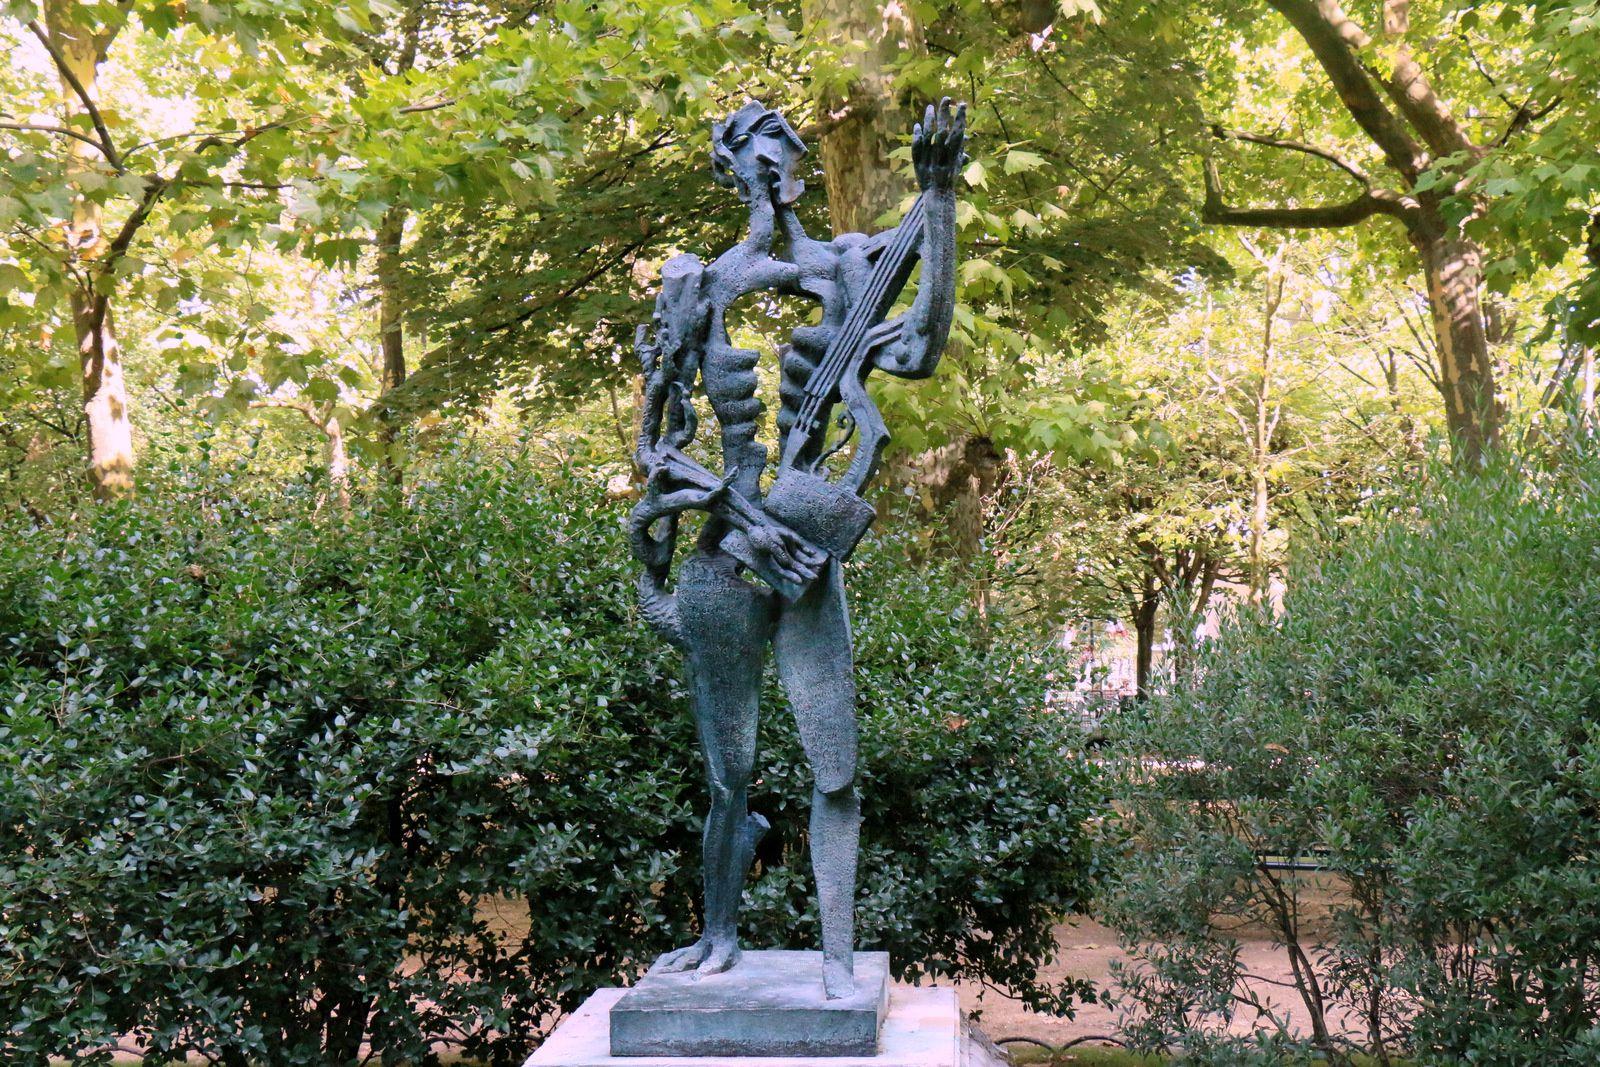 Le poète ou Hommage à Paul Eluard, statue de Ossip Zadkine